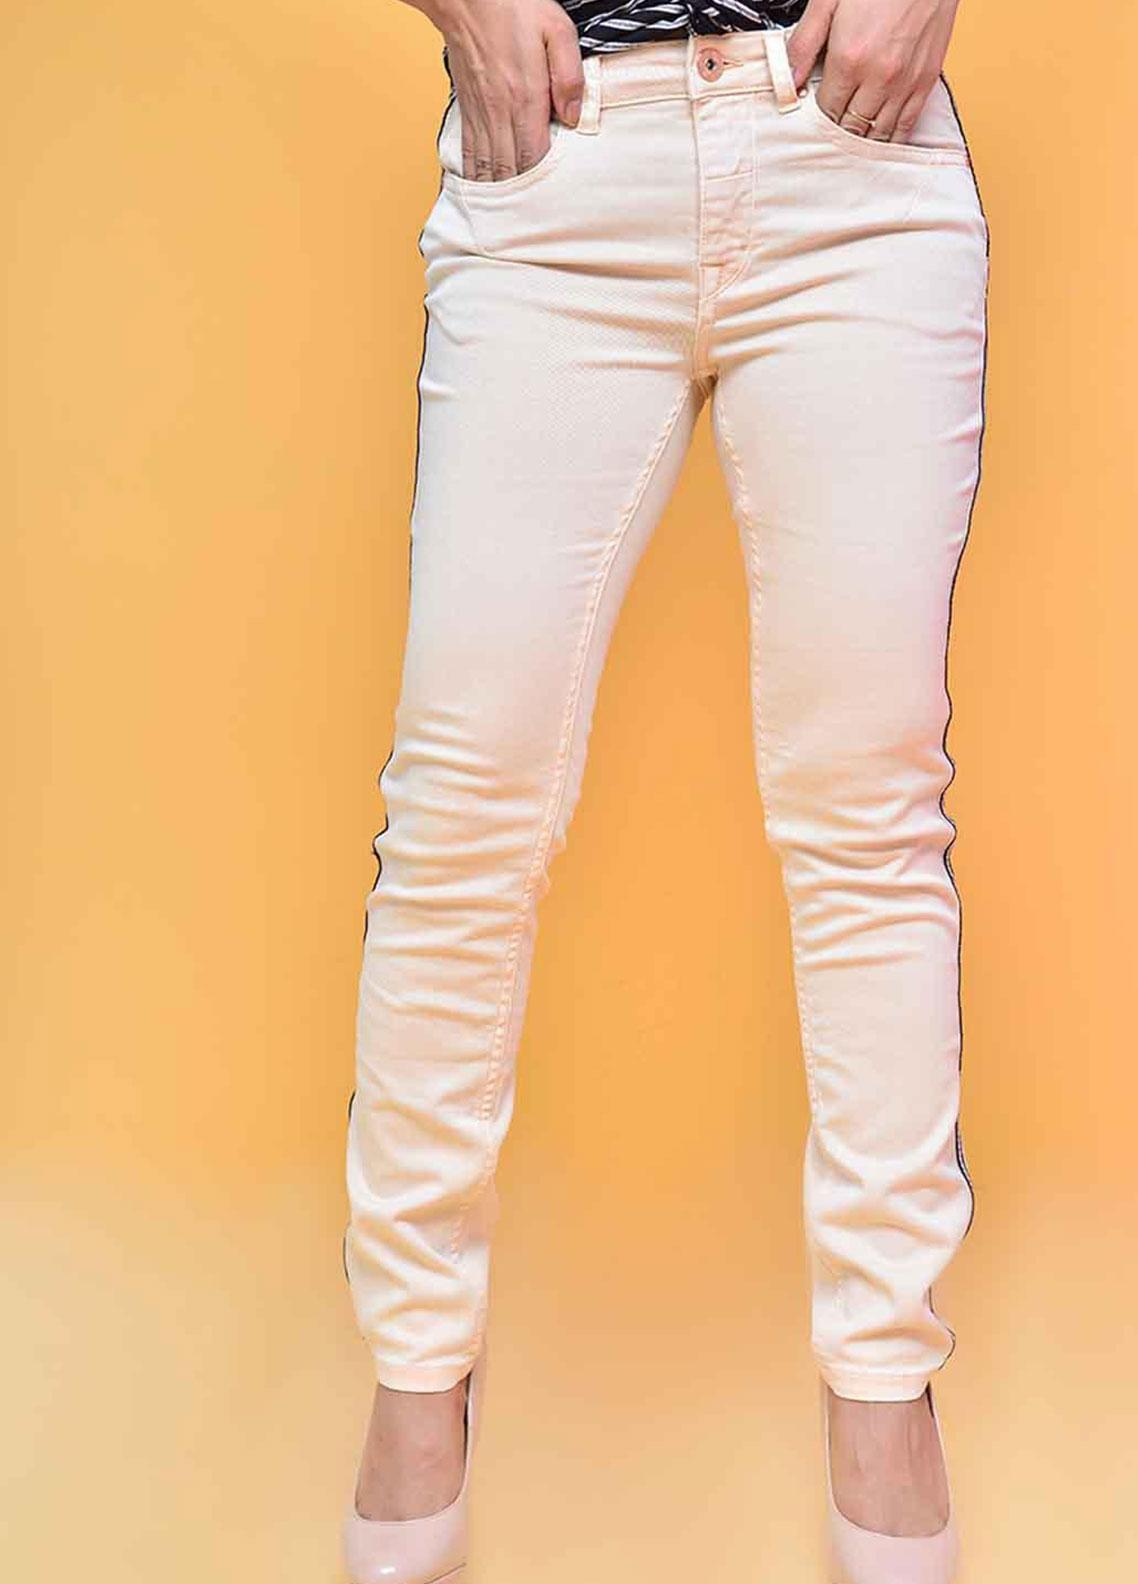 Ignite Wardrobe Tape Stretch Cotton Skinny Pants IG20PNW 003